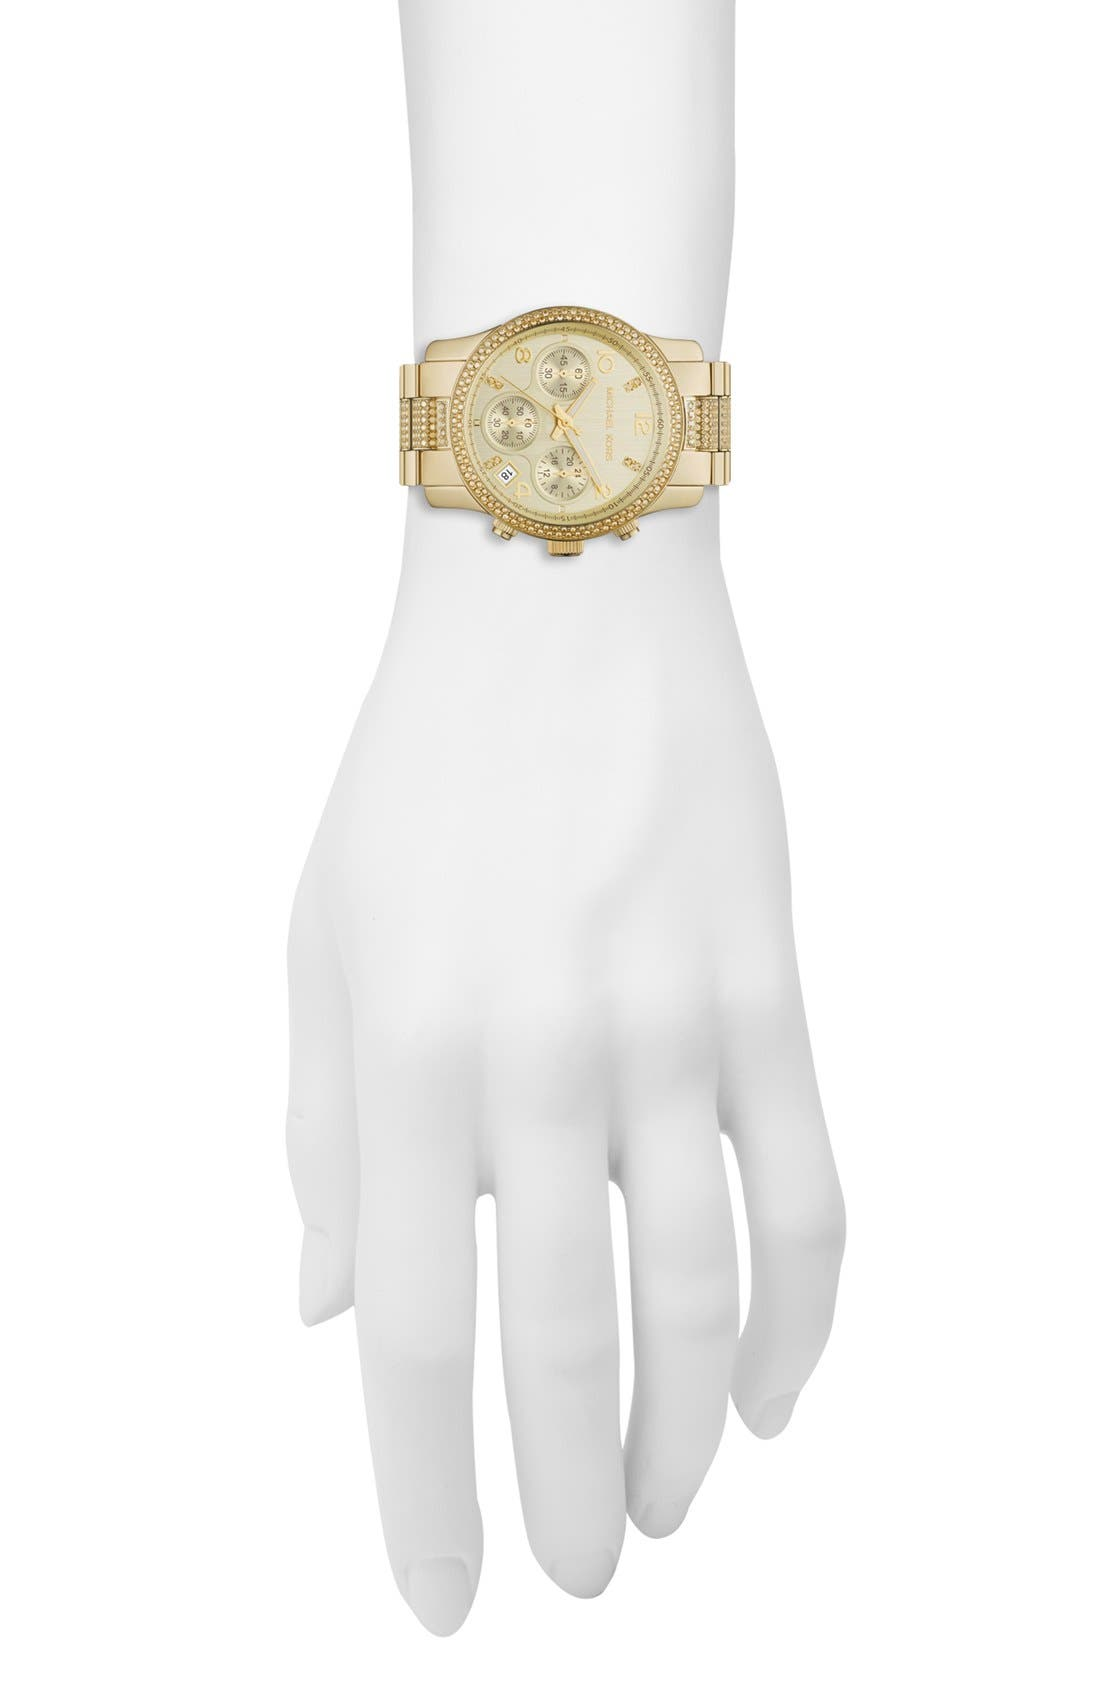 Alternate Image 2  - Michael Kors 'Runway' Crystal Chronograph Bracelet Watch, 38mm